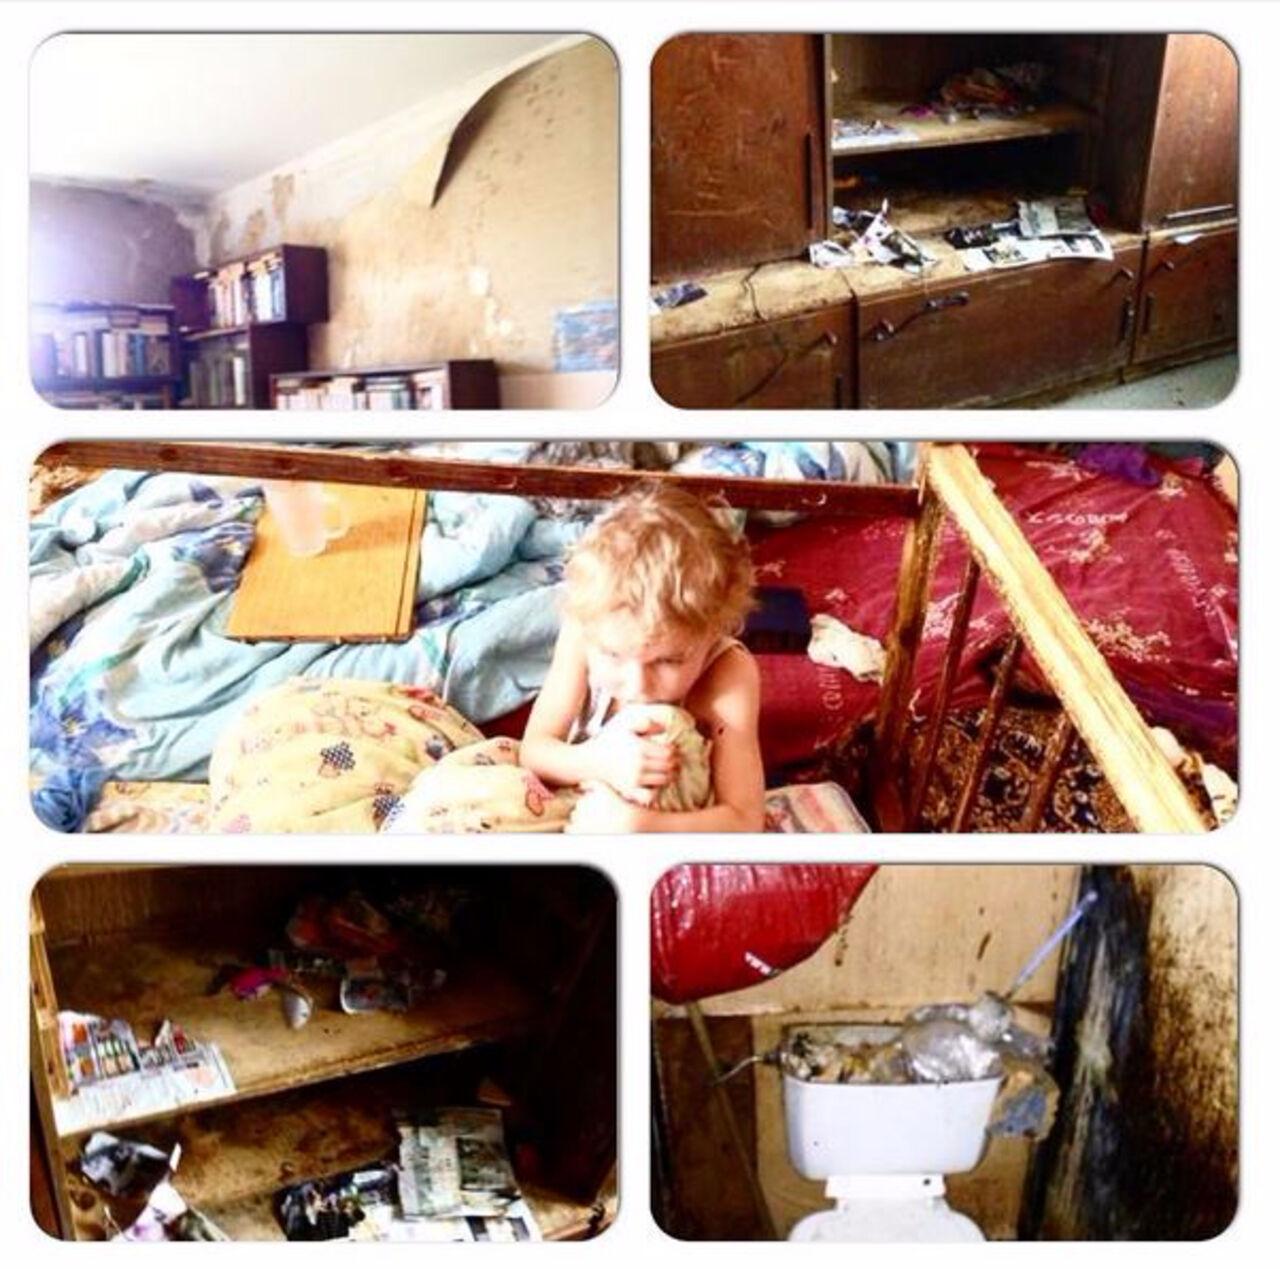 Пьяная хозяйка квартиры 15 фотография